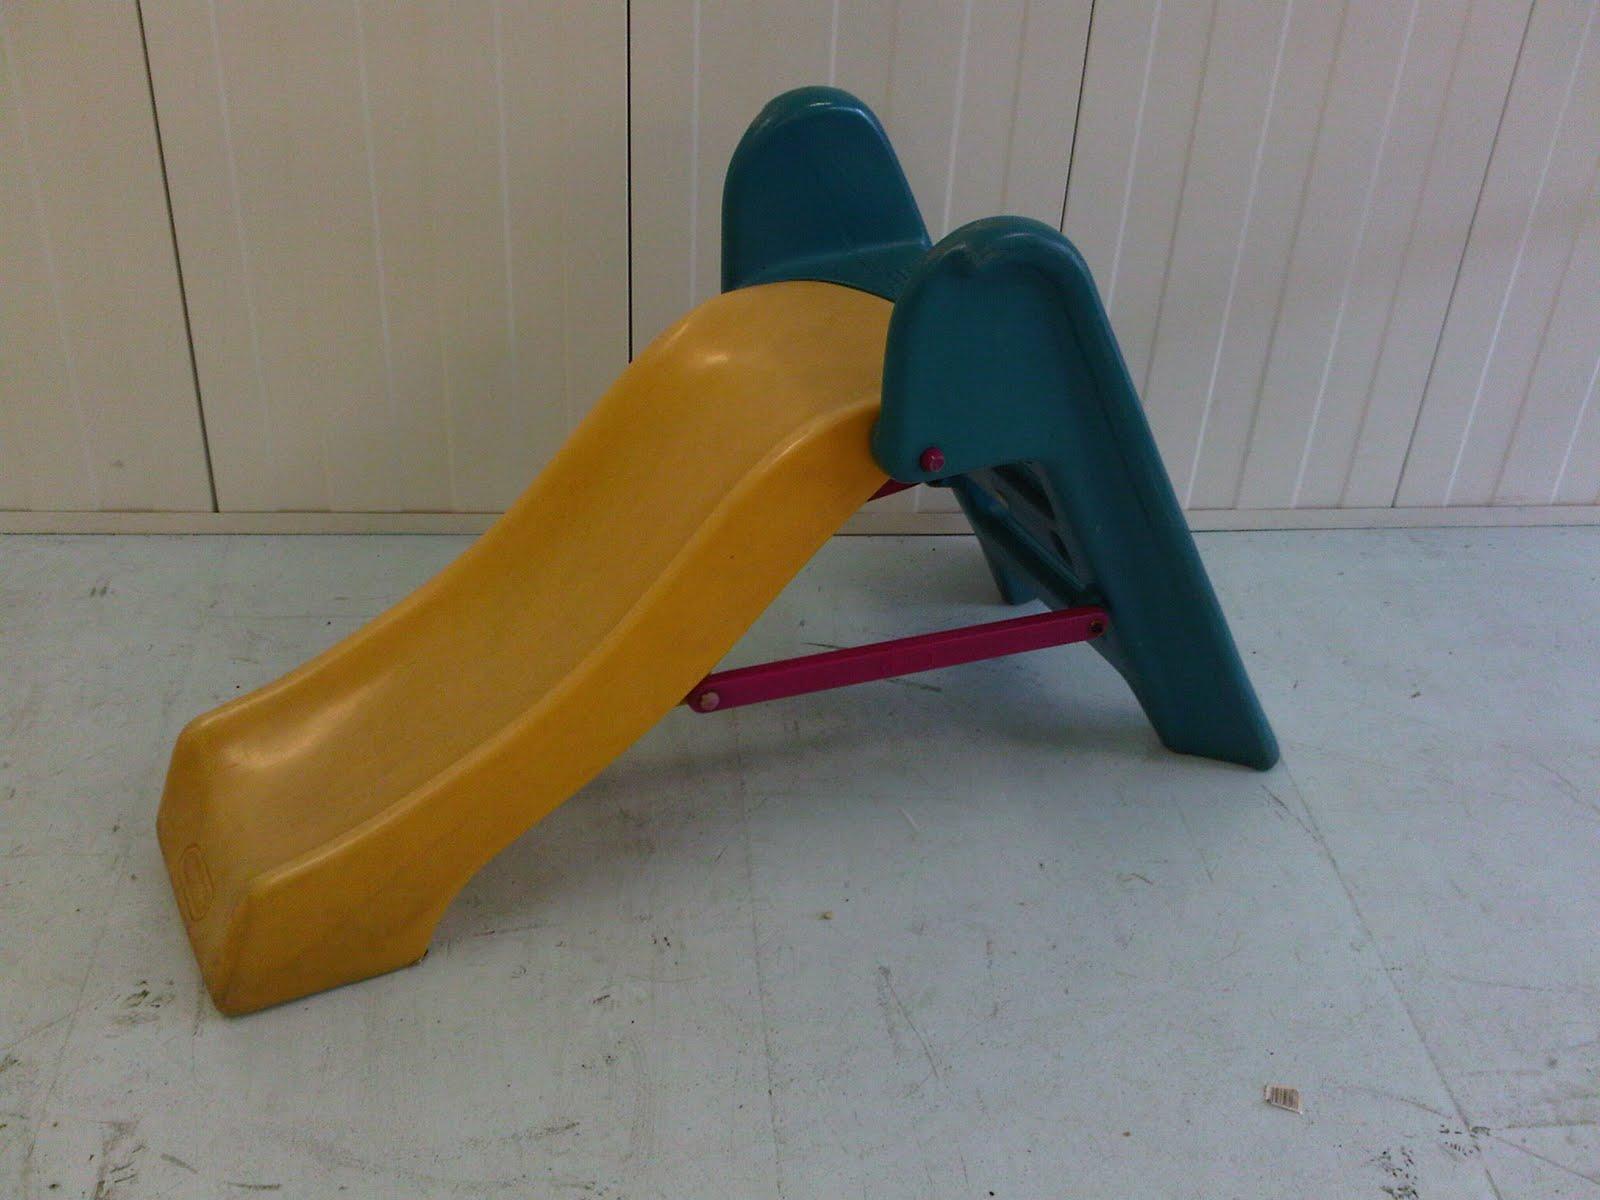 Little Tikes Orange Slides : Colourful little tikes slide